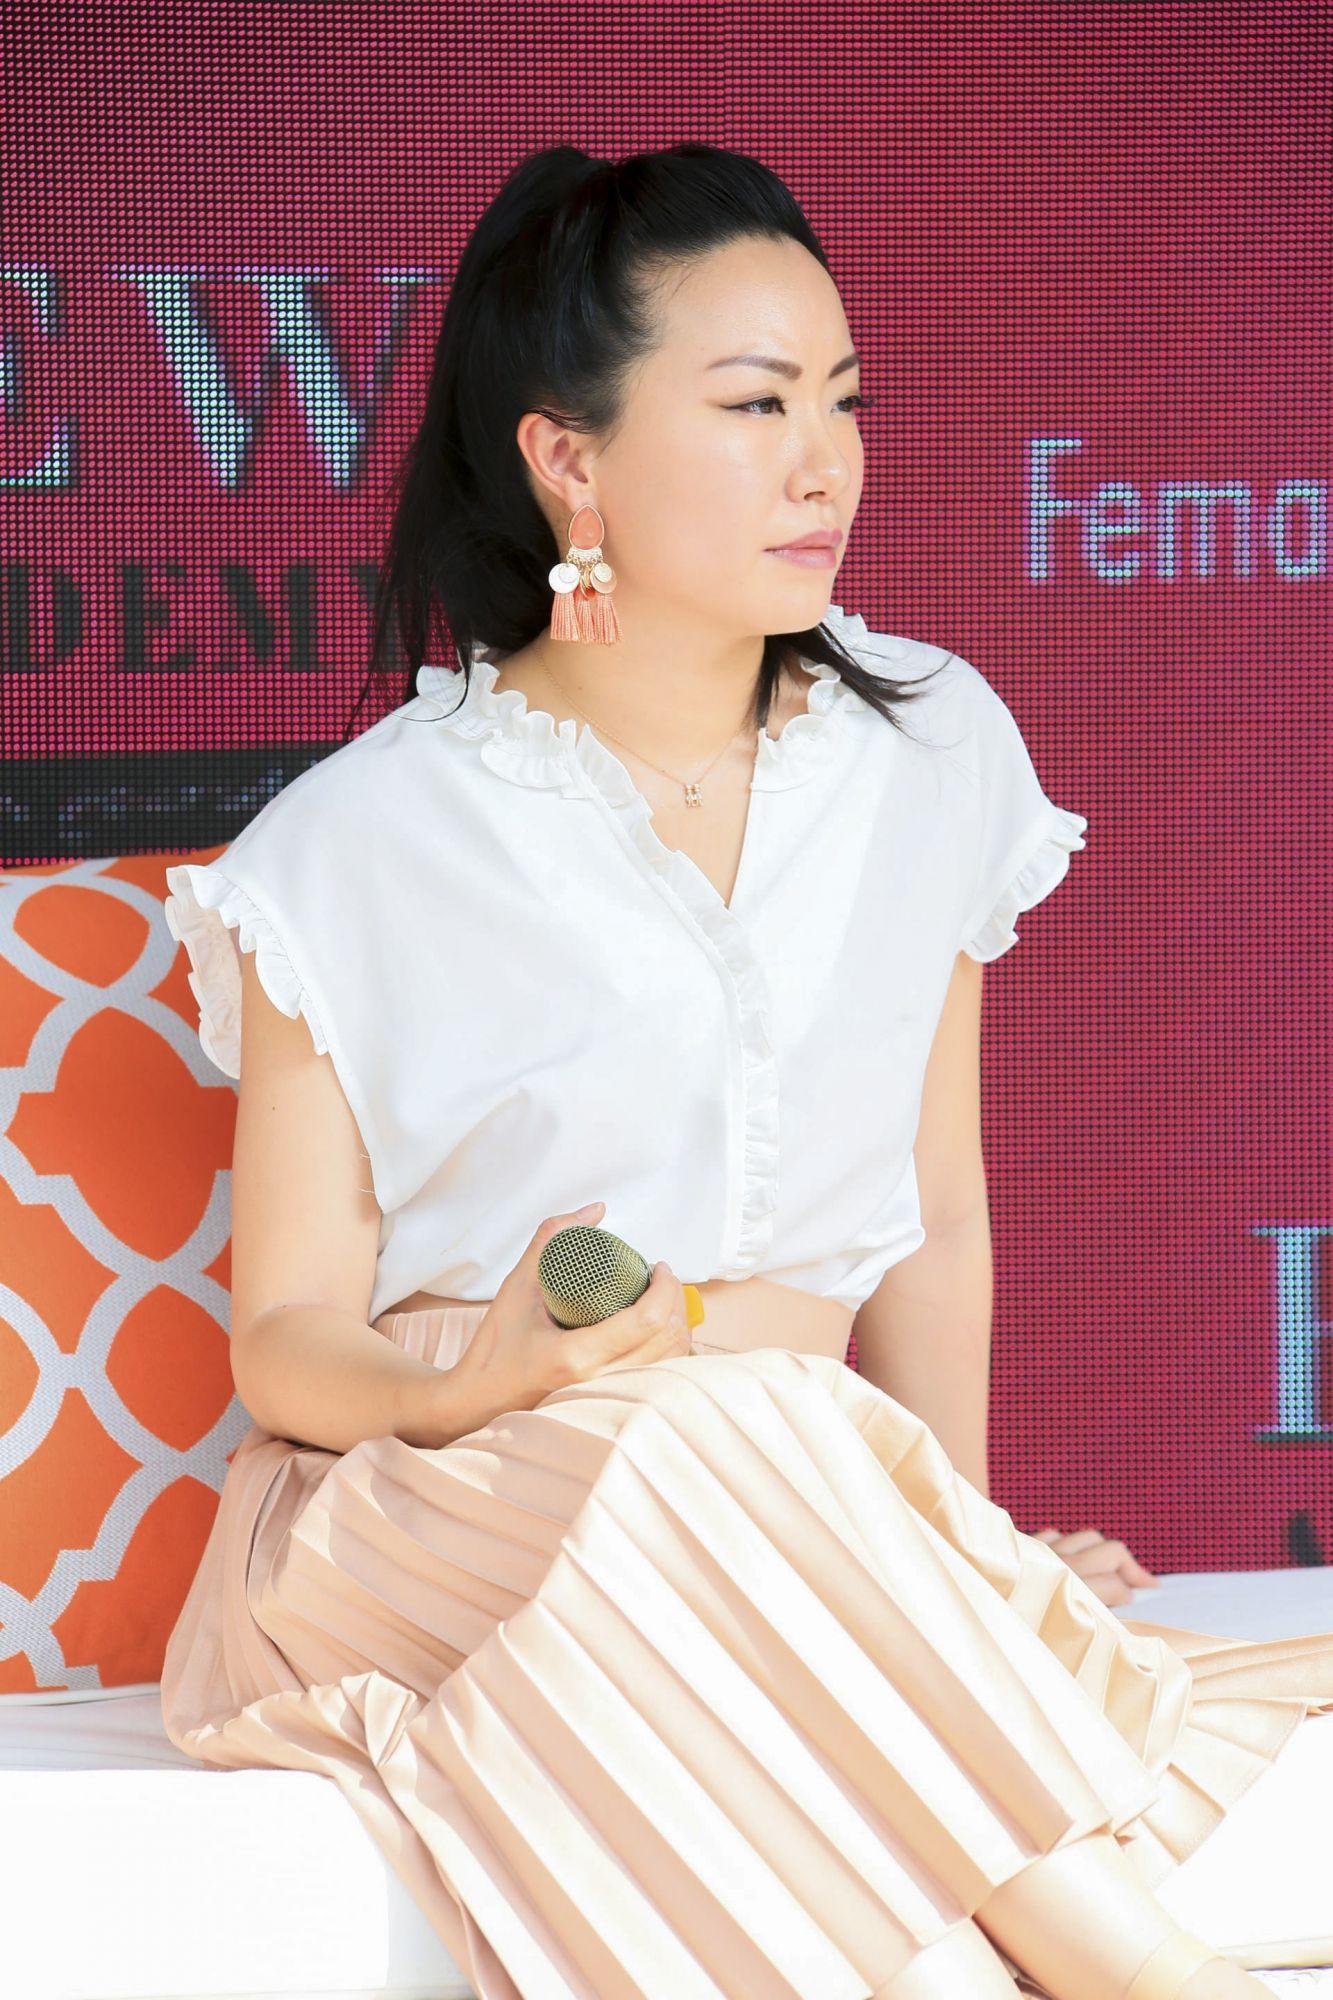 Ruth Chao